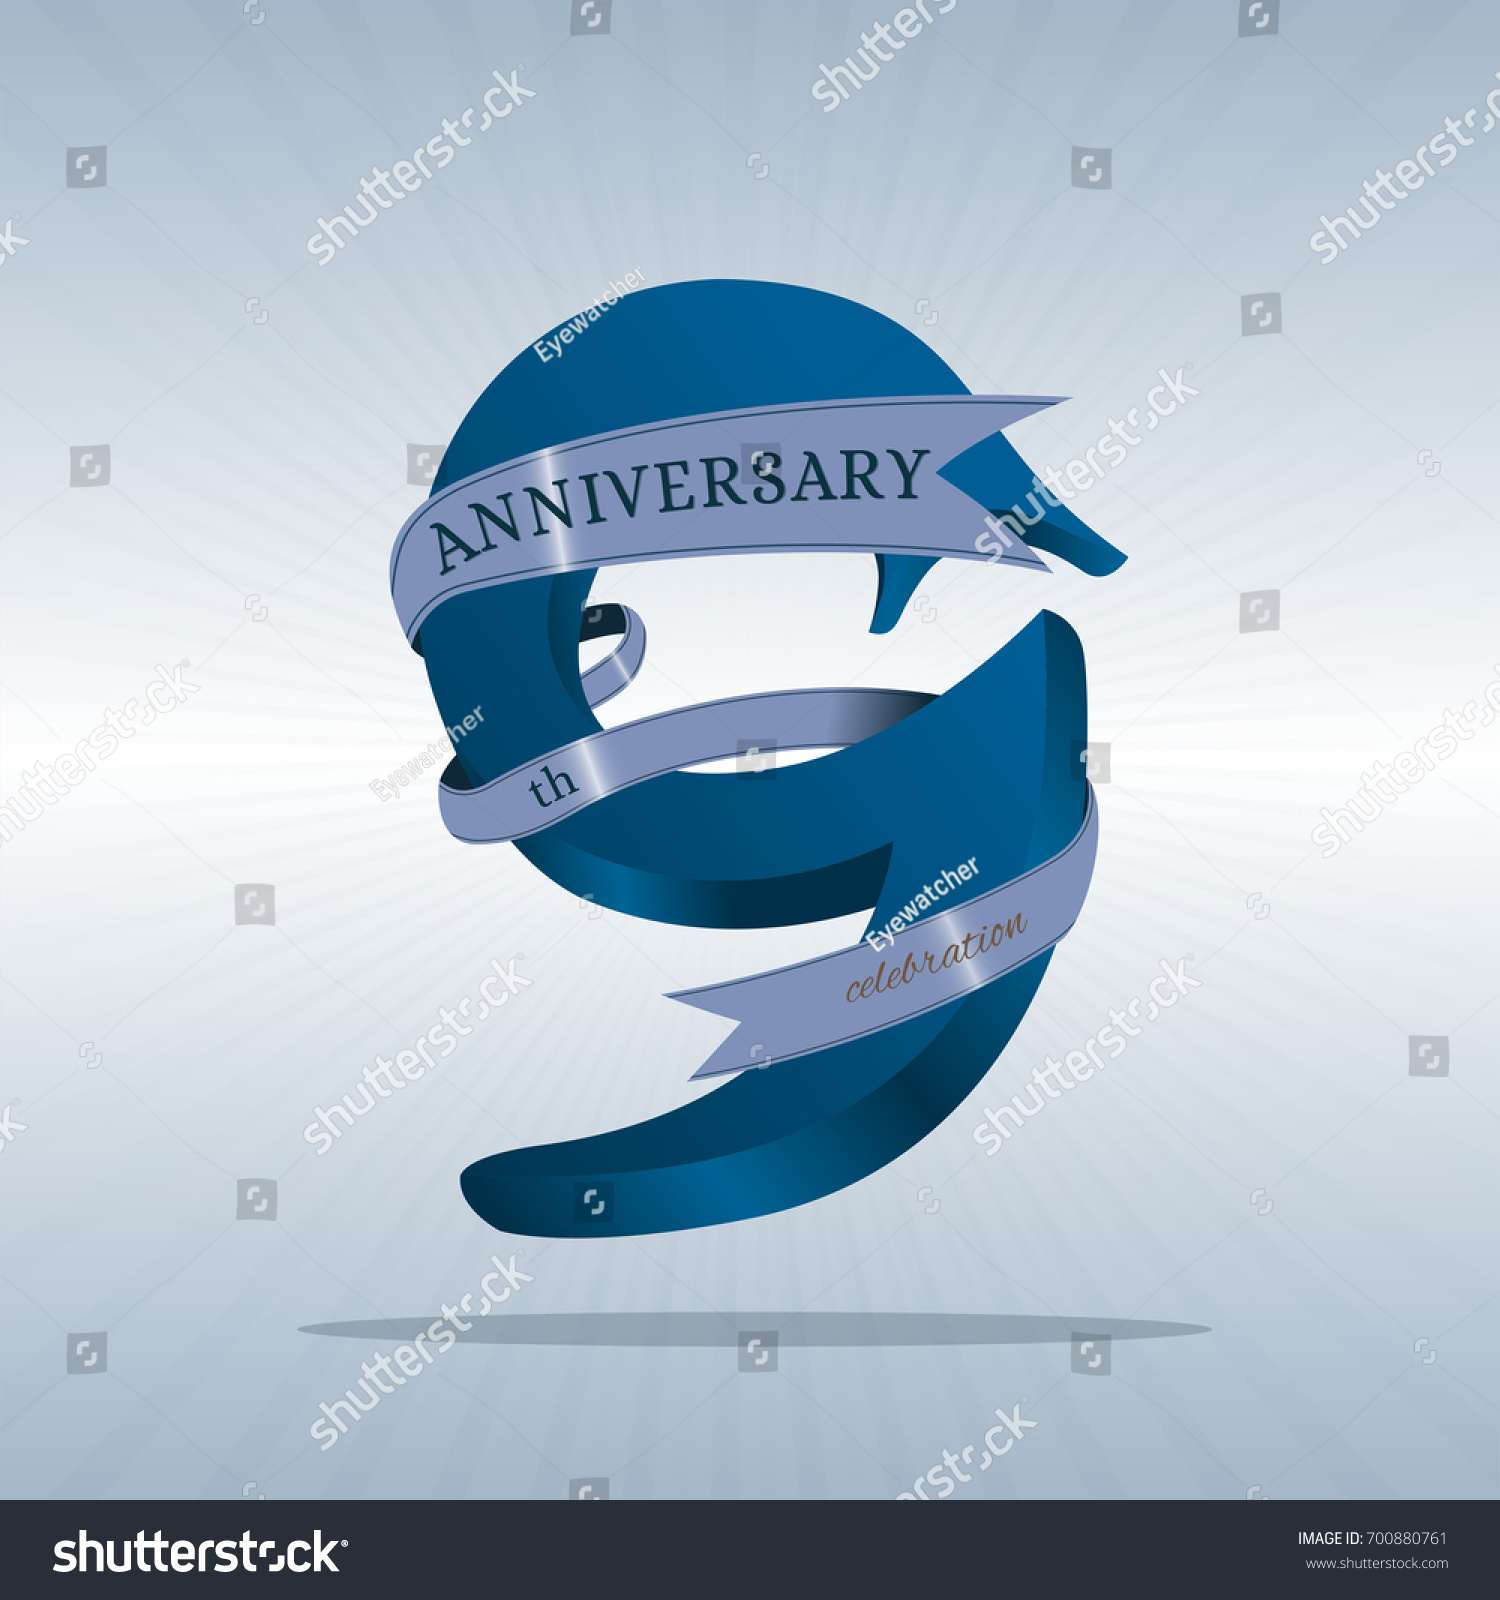 9th Anniversary Symbol Vector Stock Vector 700880761 Shutterstock